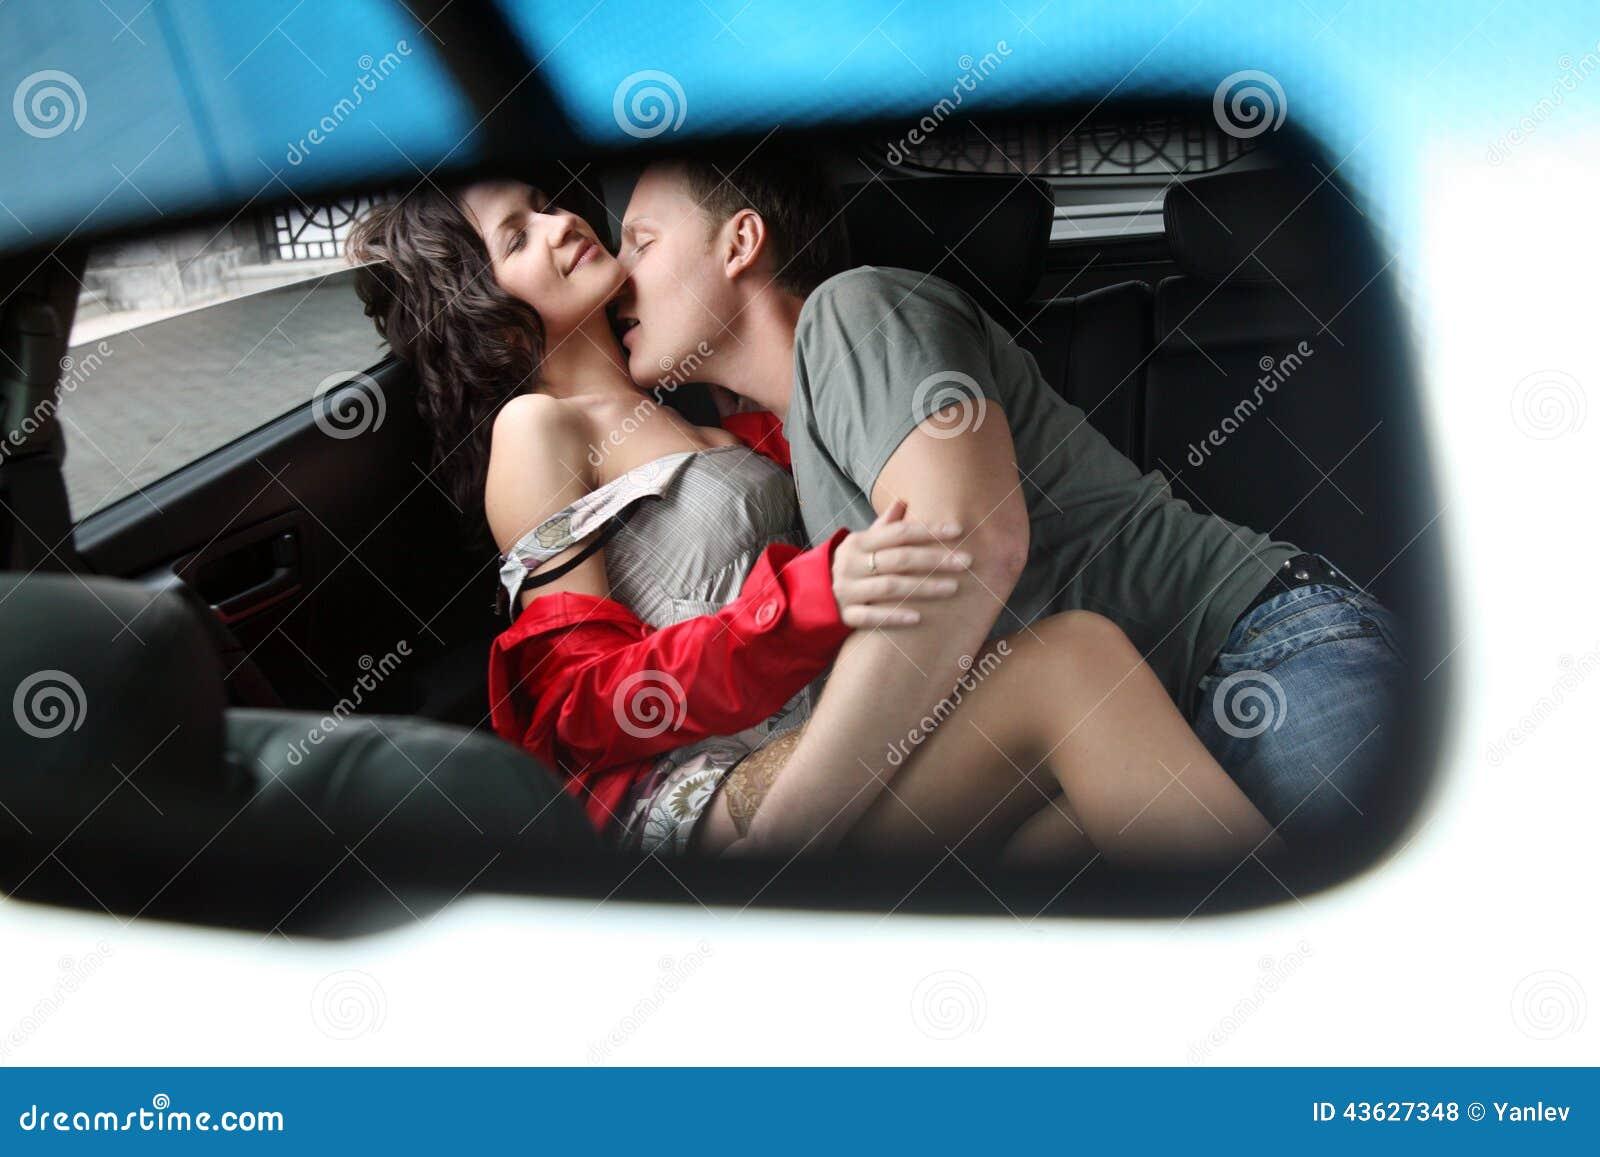 Car Free Sex 17